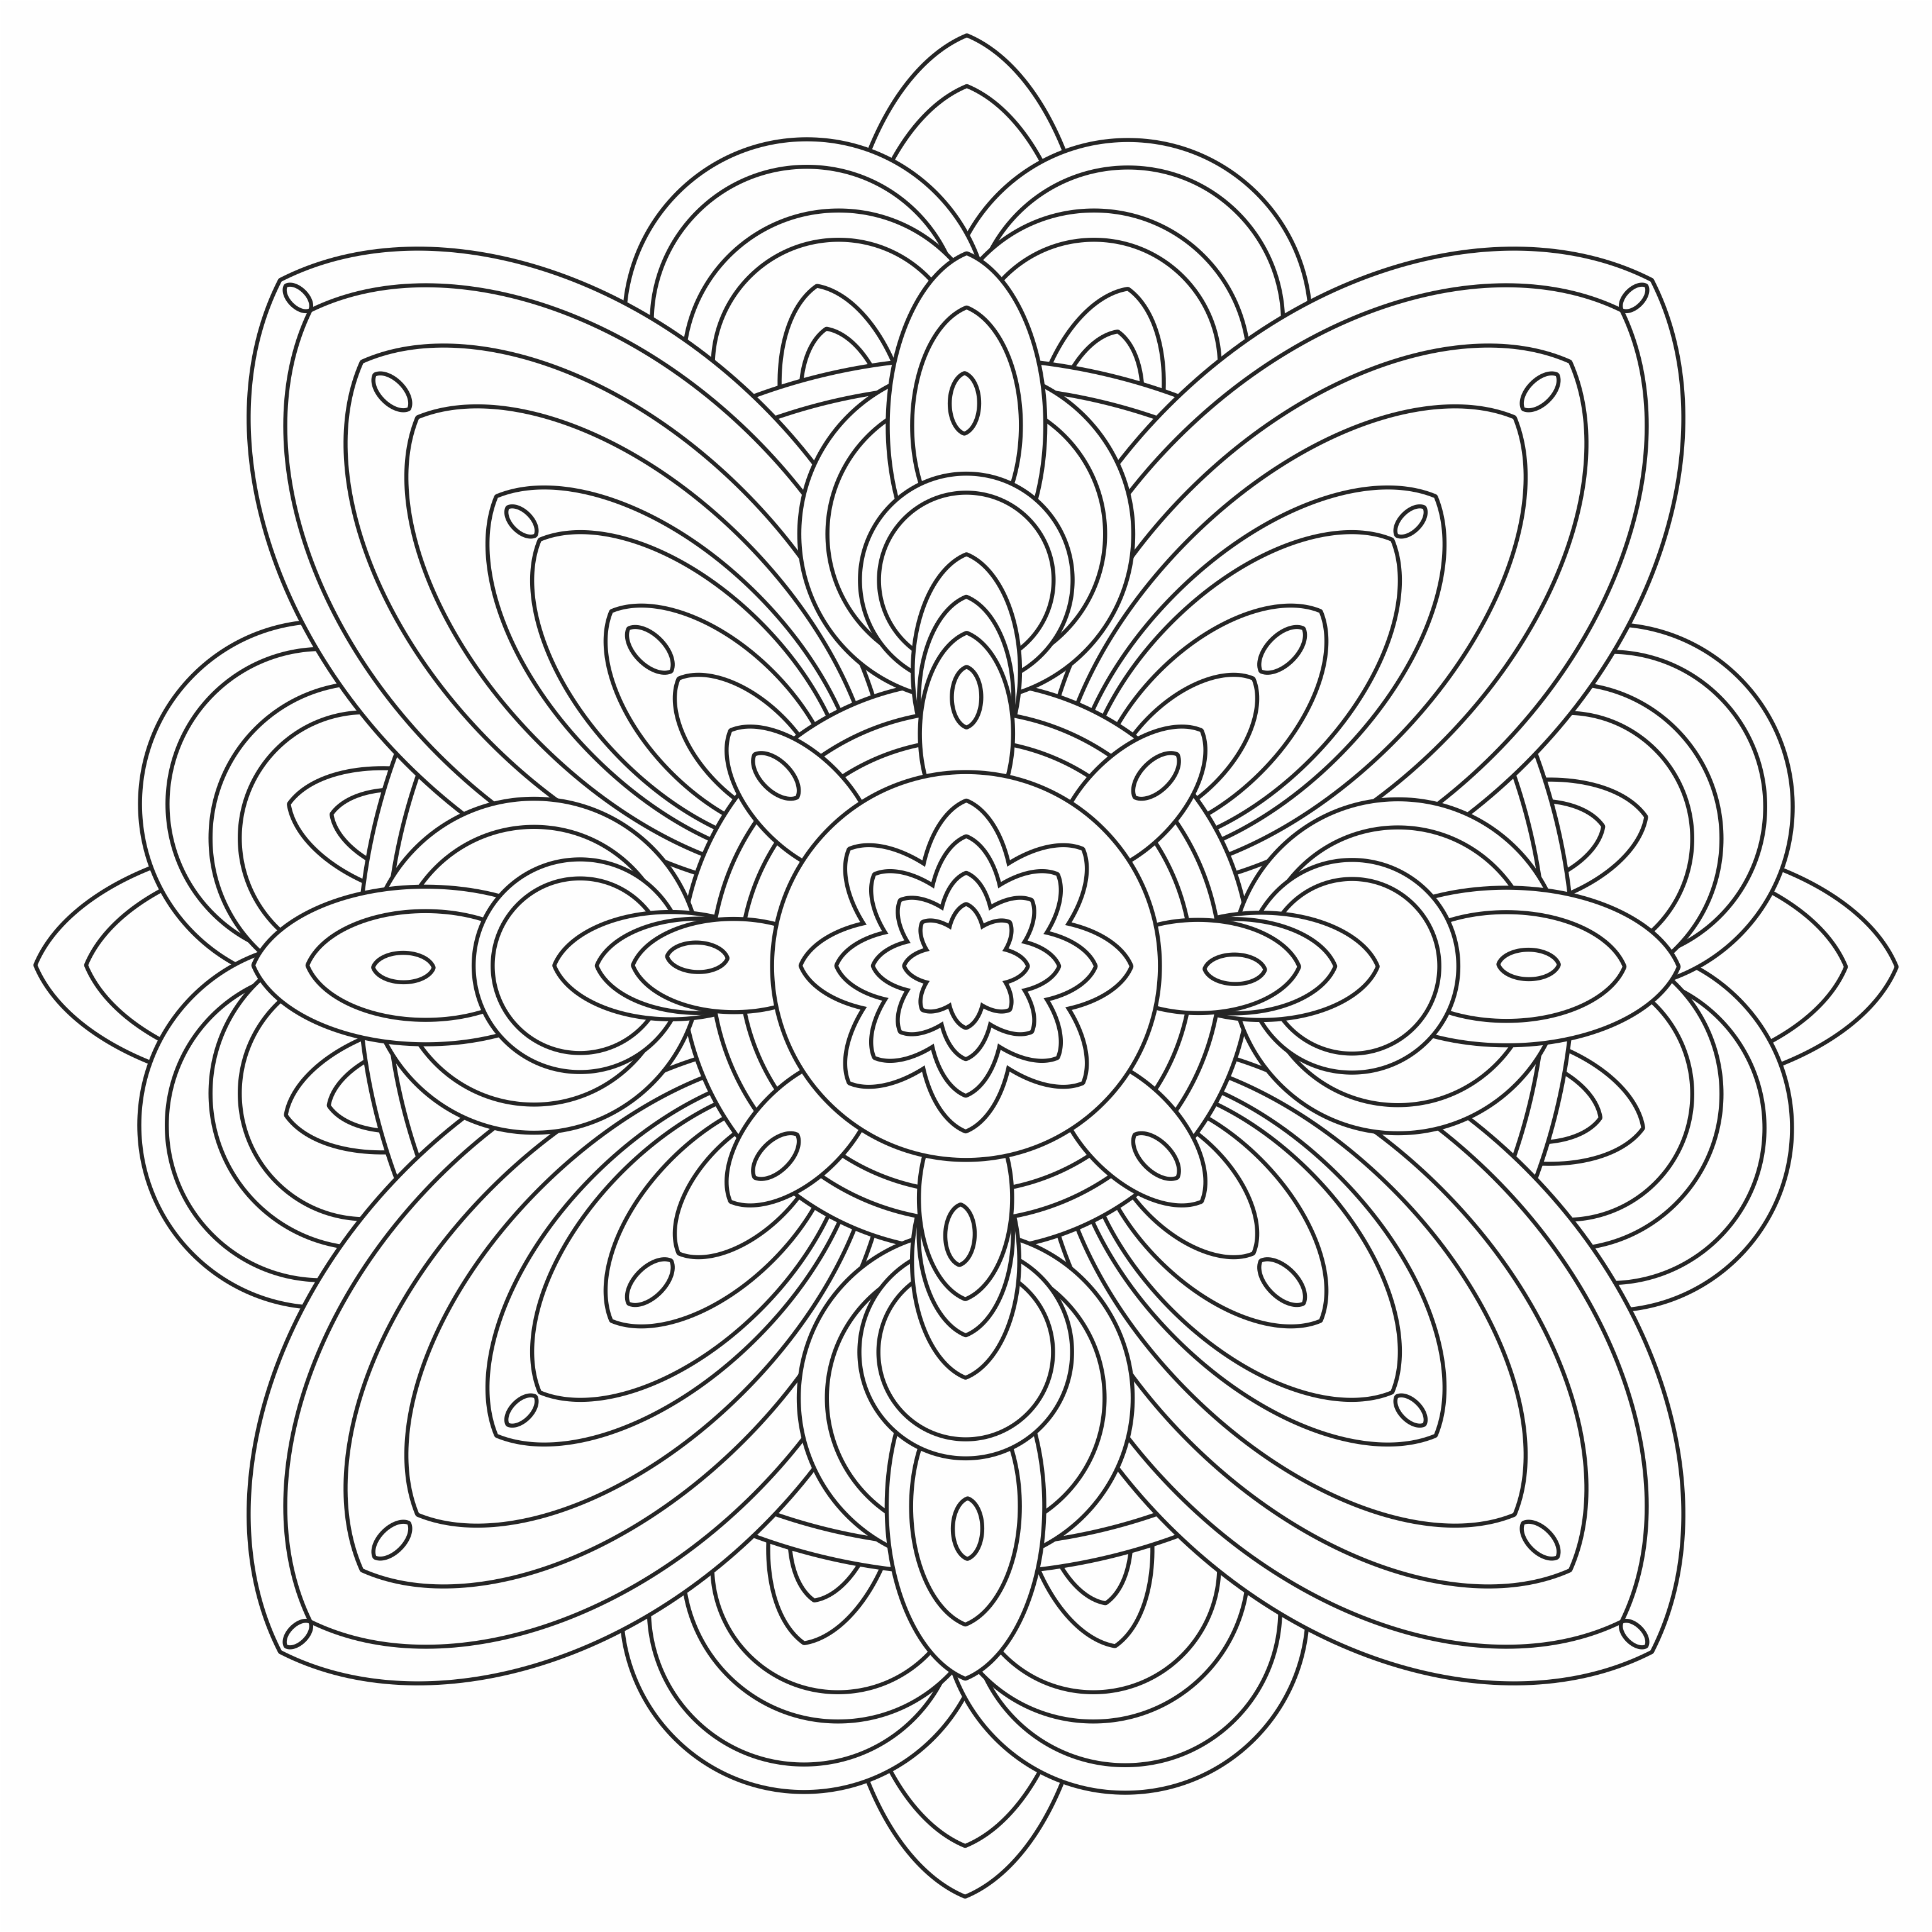 Mandalas para colorir imagens png for Schuhschrank no name 05 sp